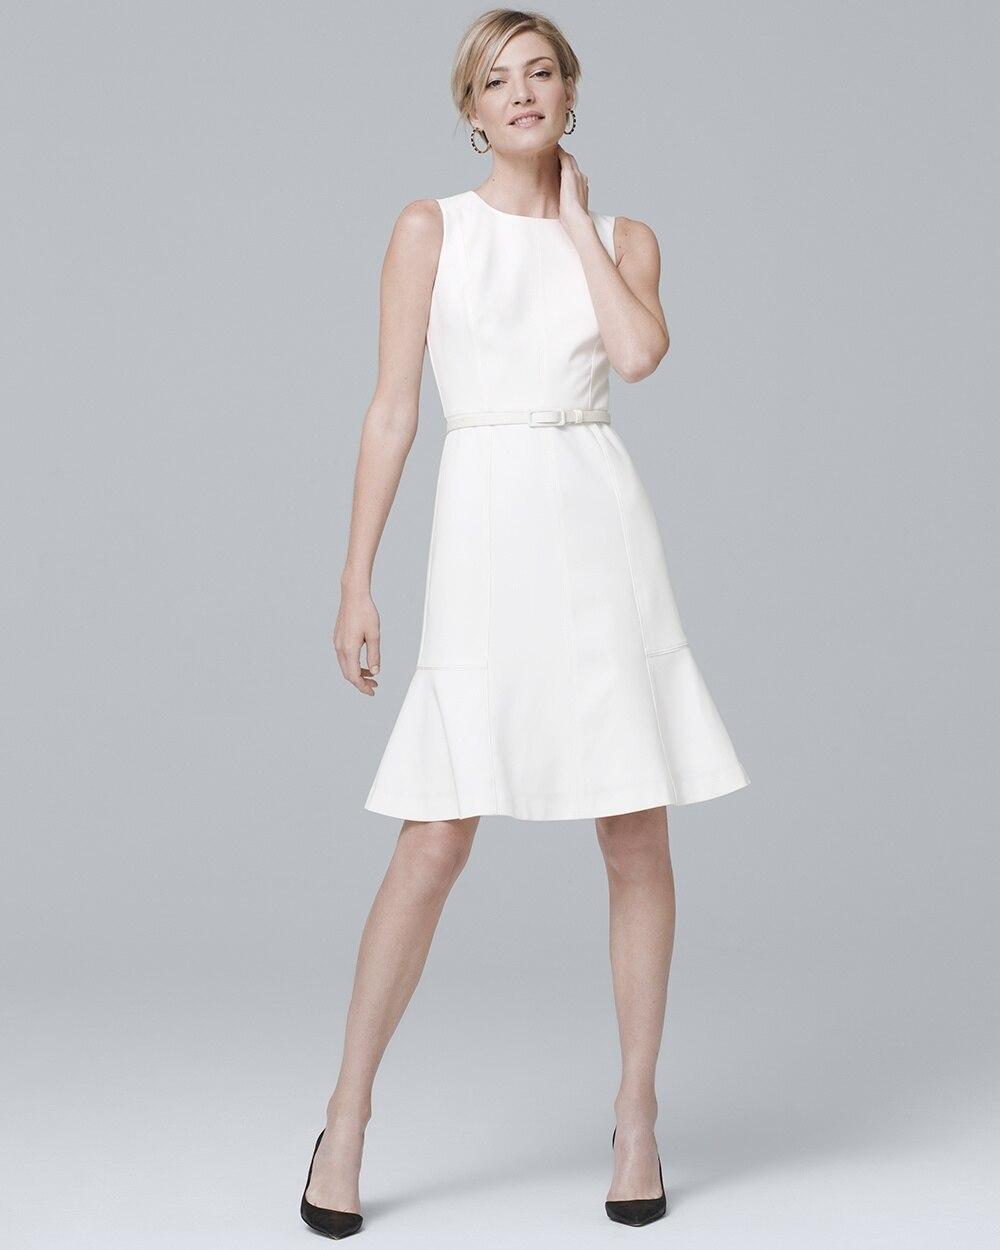 7c3d9e15f3d Belted A-Line Dress - White House Black Market